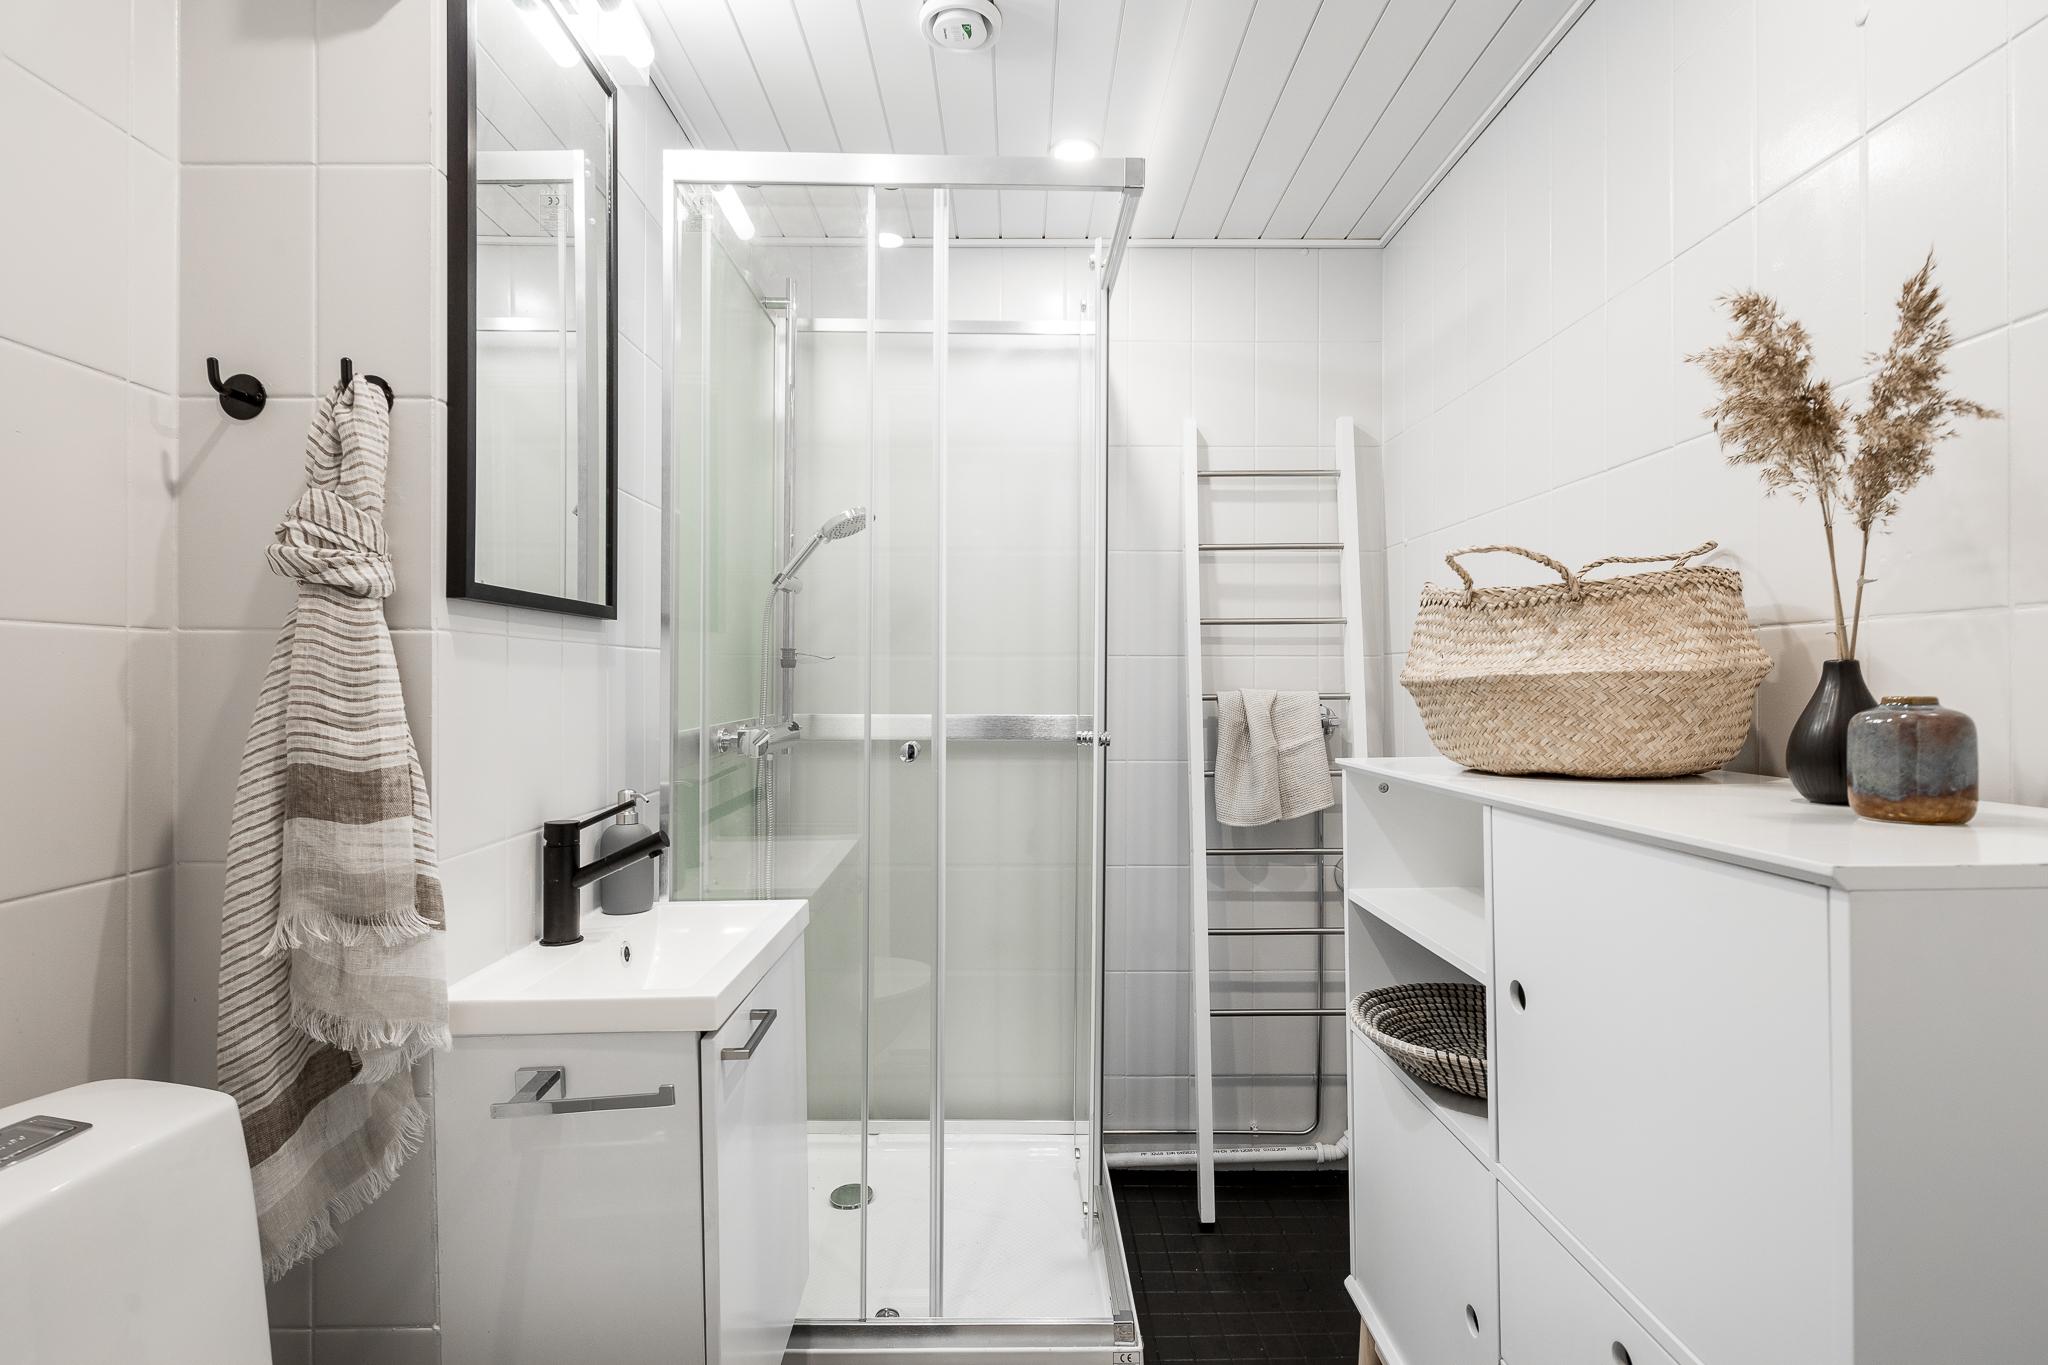 Remontoitu pieni kylpyhuone